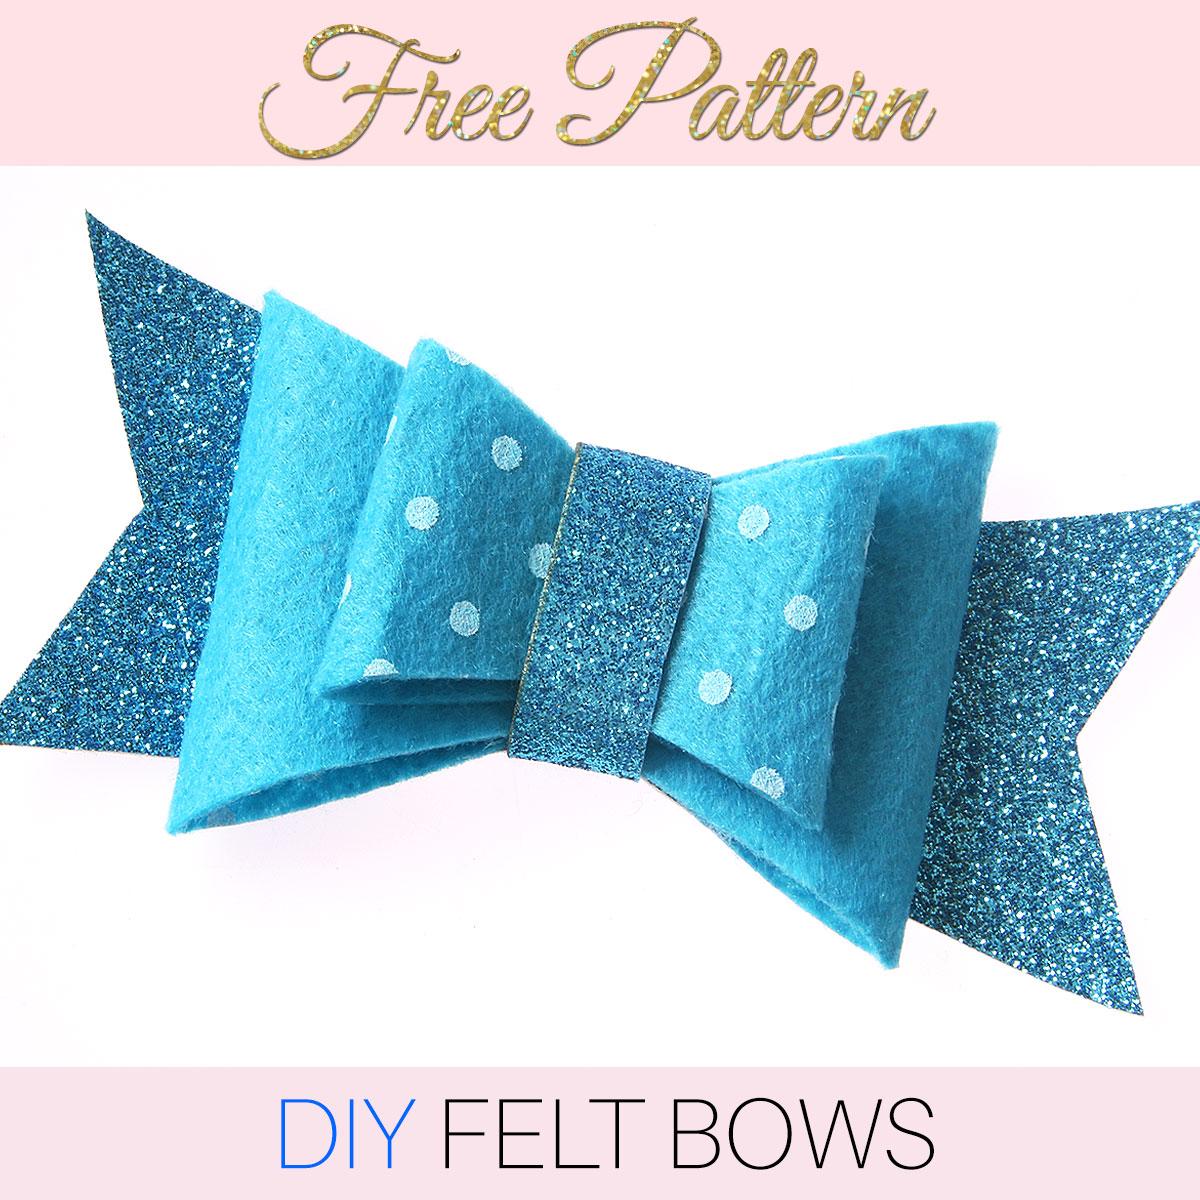 Diy Felt Bow With Free Printable Pattern Treasurie